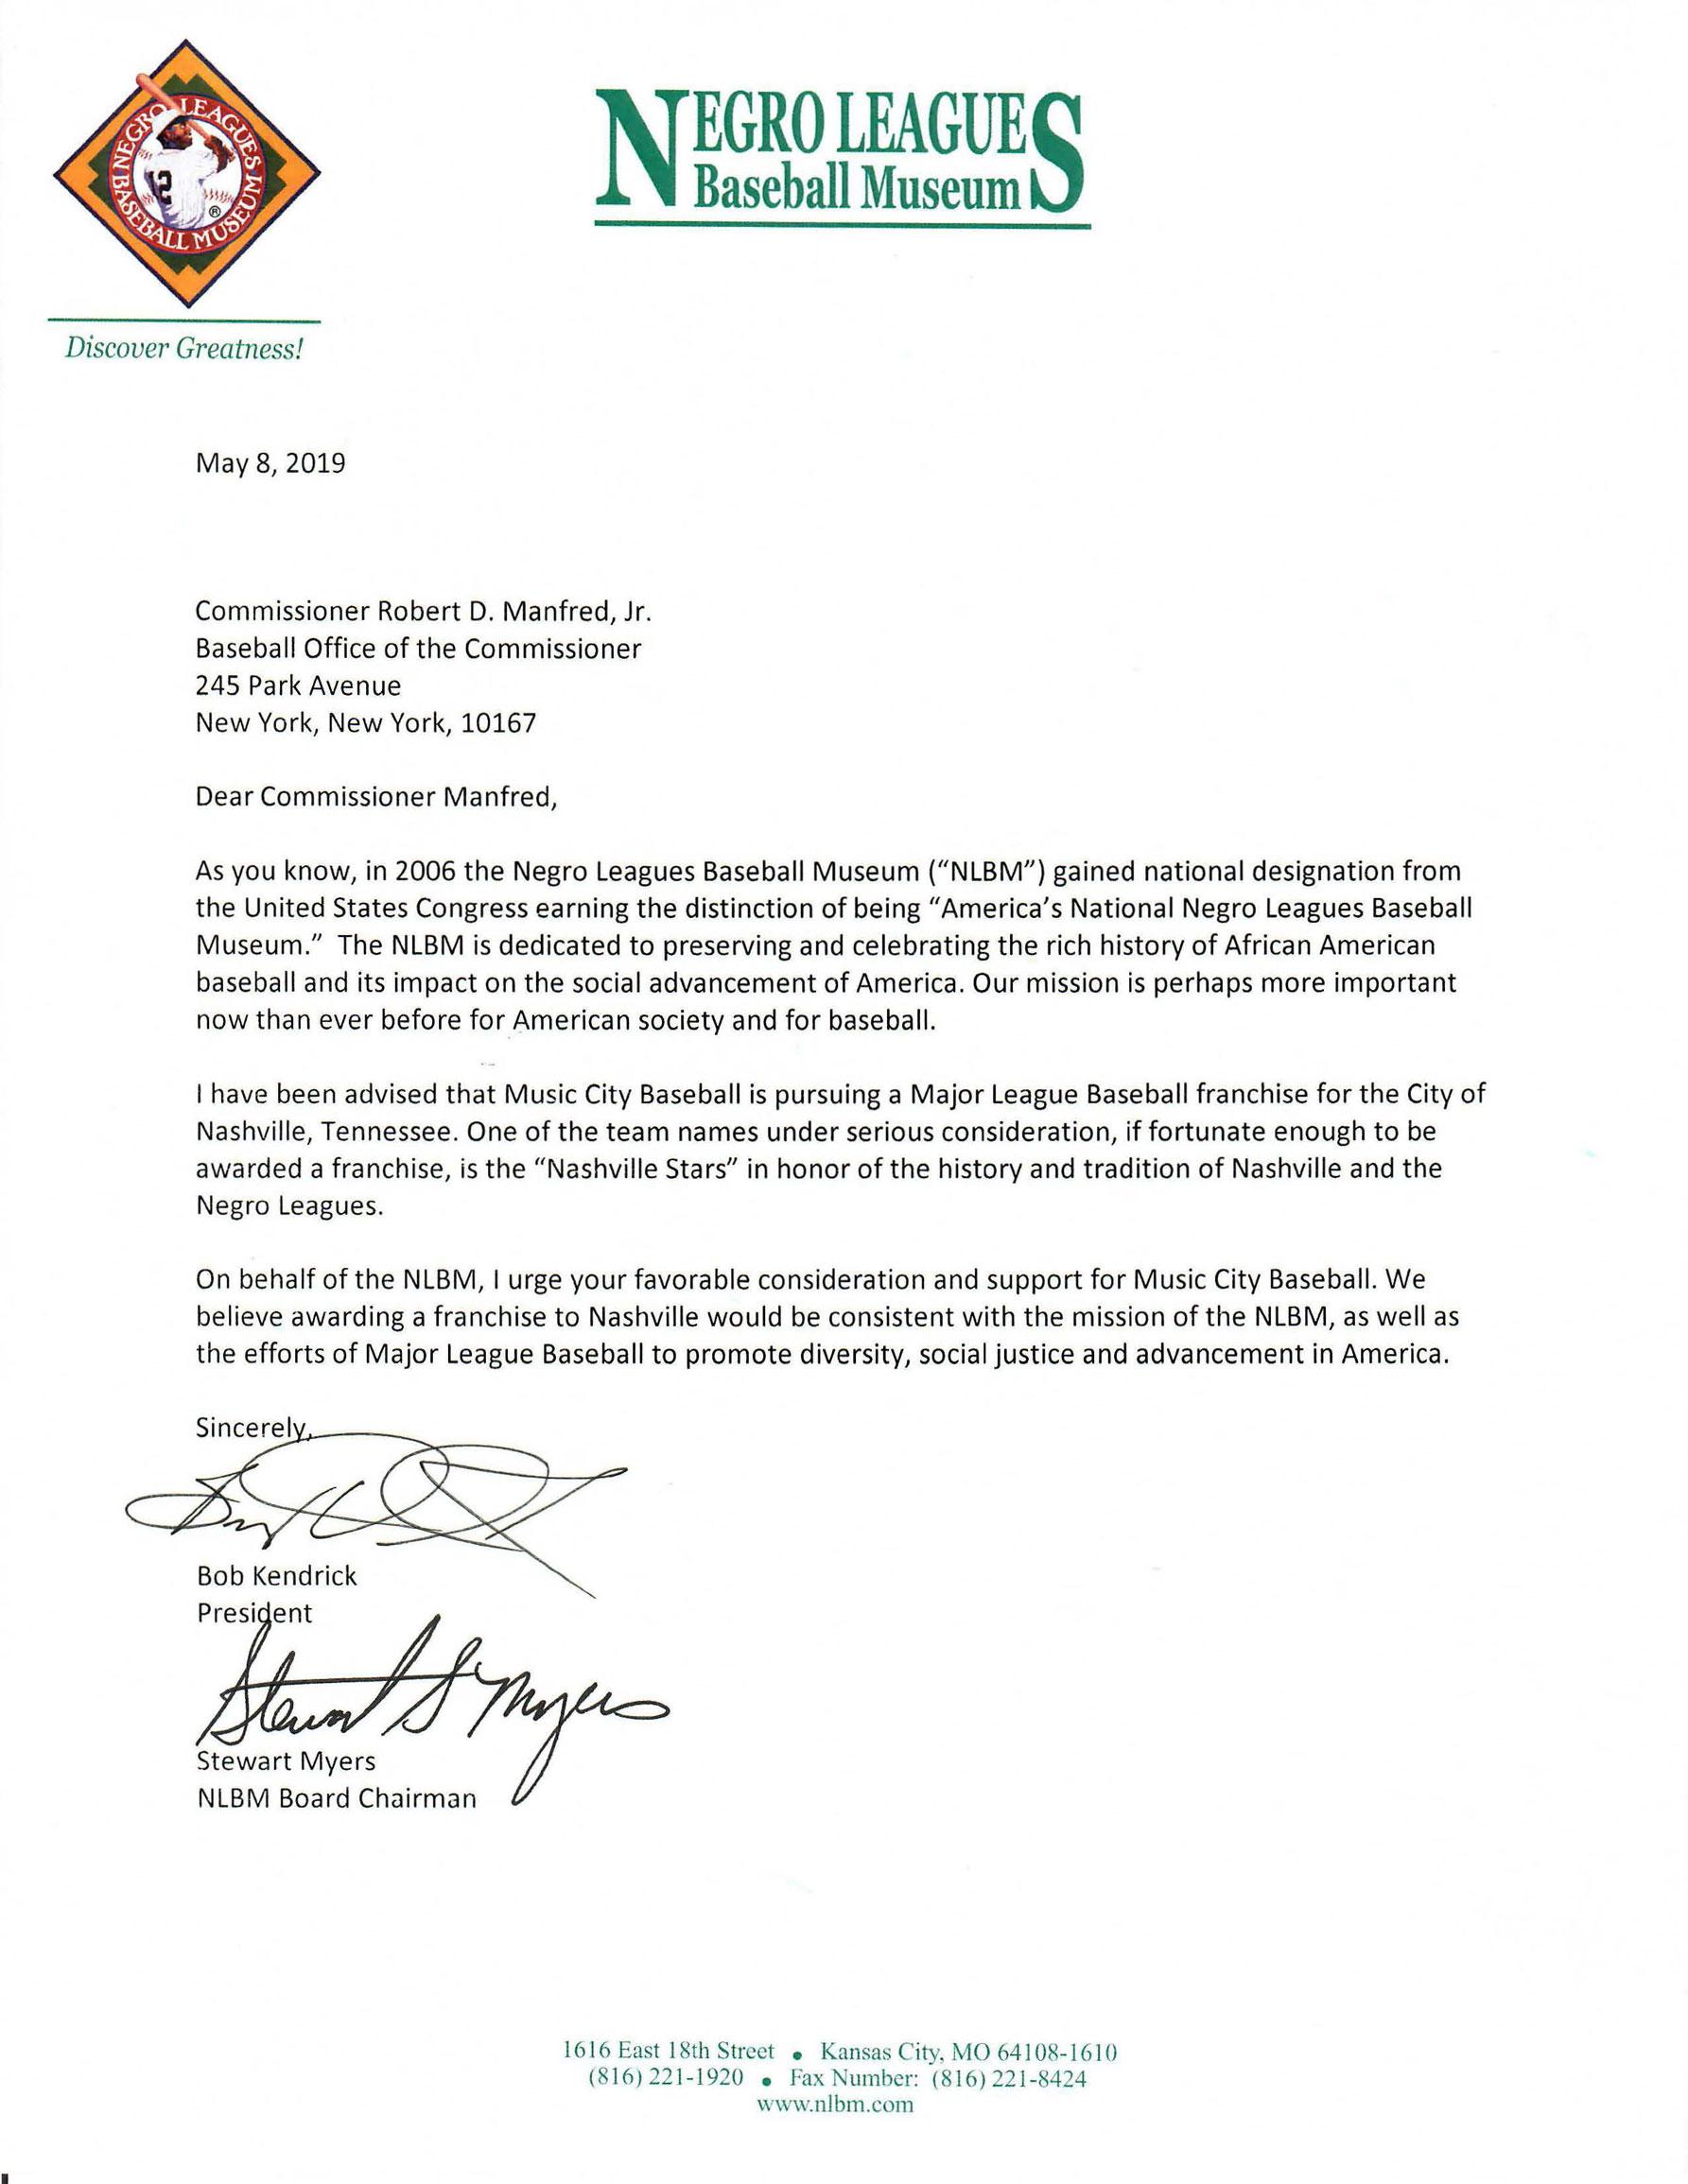 Negro Leaques Baseball Museum Letter